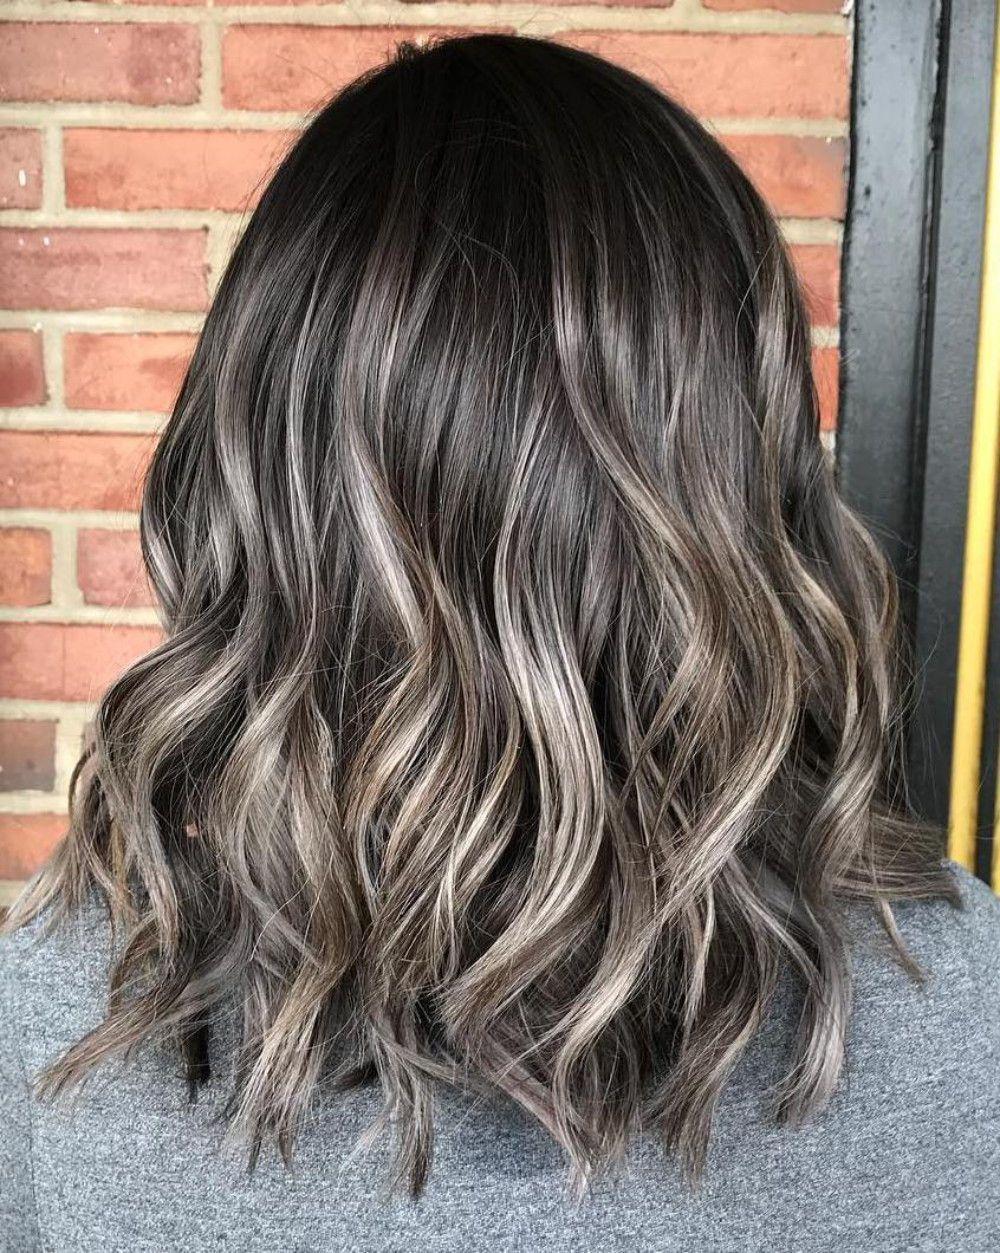 Ash Brown And Subtle Gray Highlights For Brunettes Gray Balayage Short Hair Balayage Balayage Lob